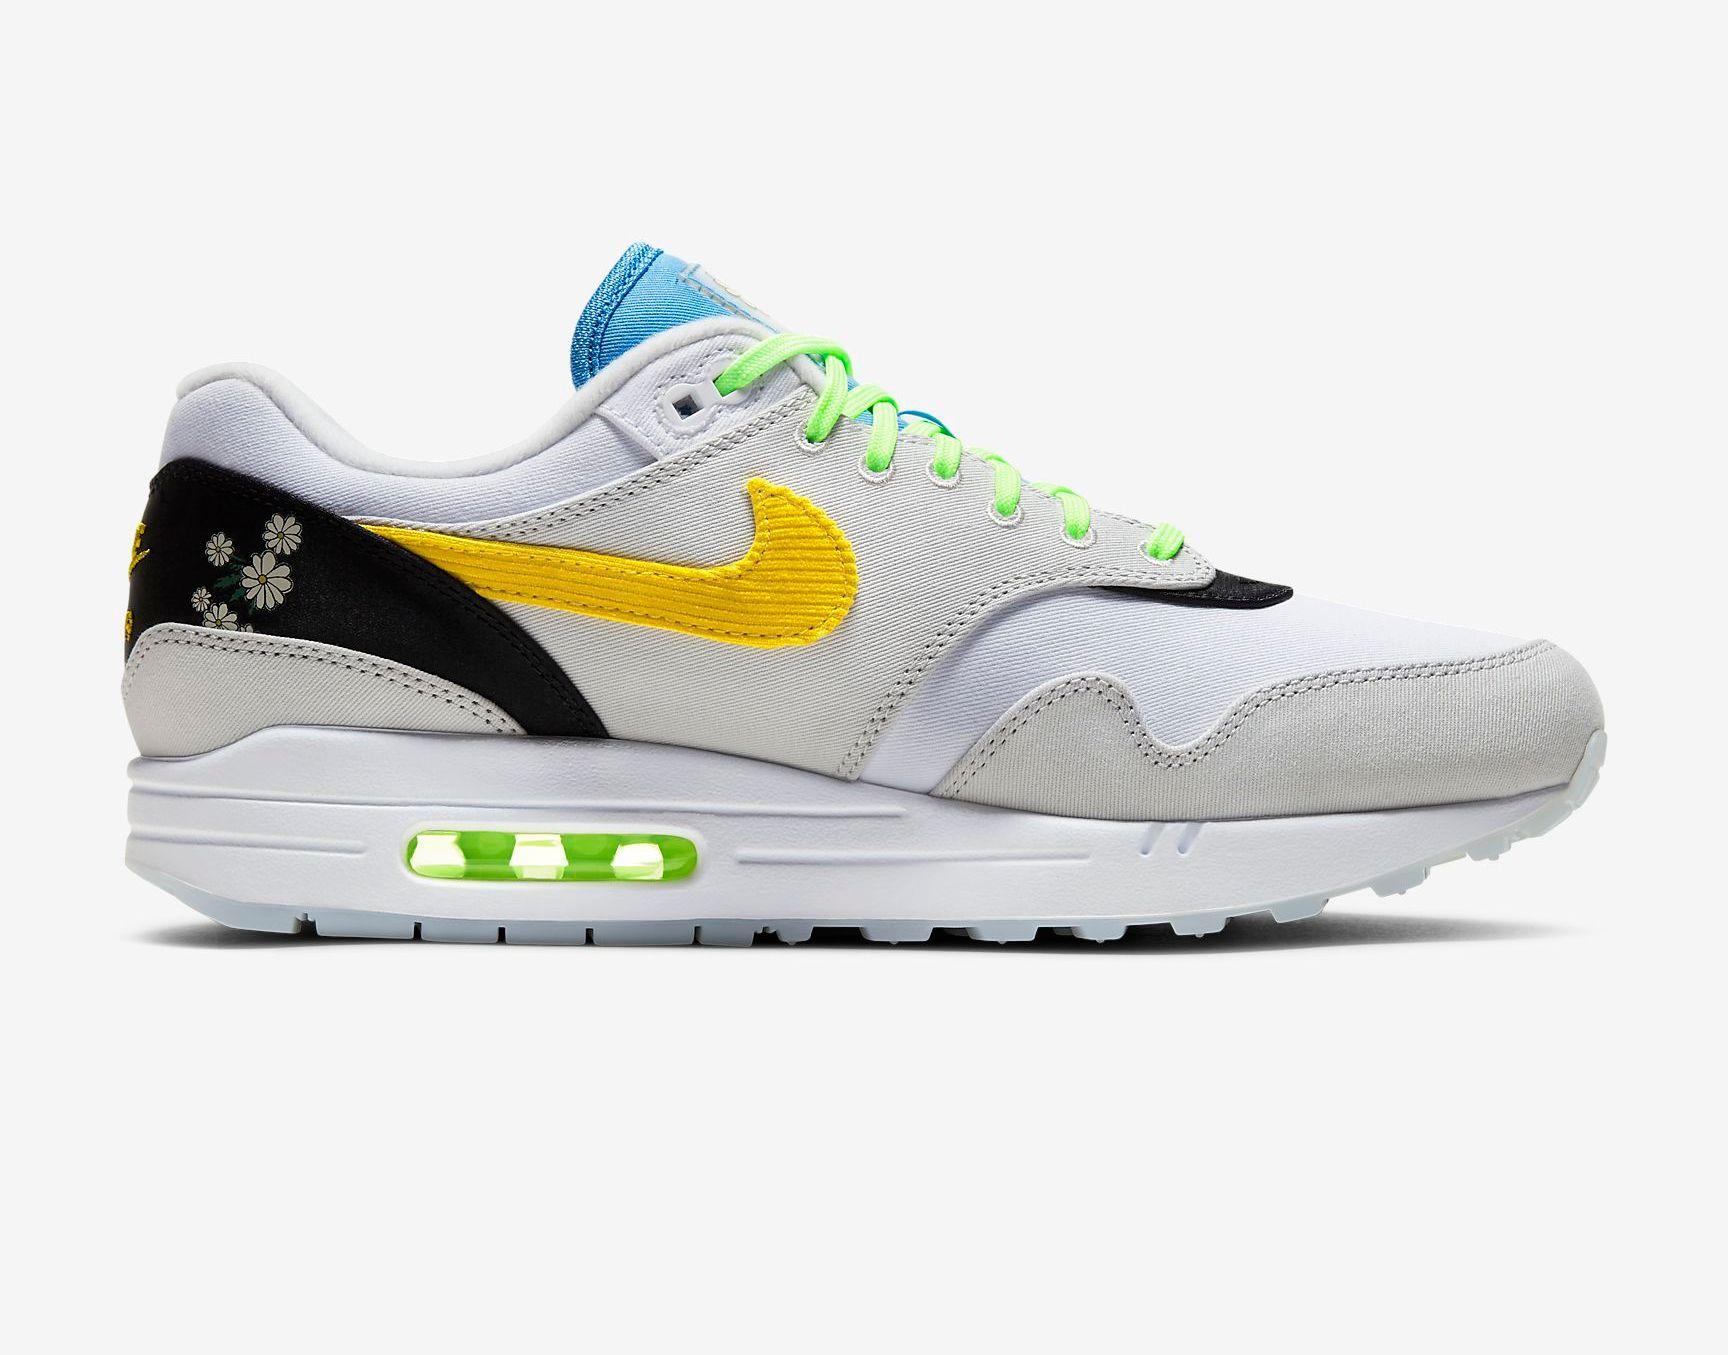 Nike Air Max 1 Daisy Right